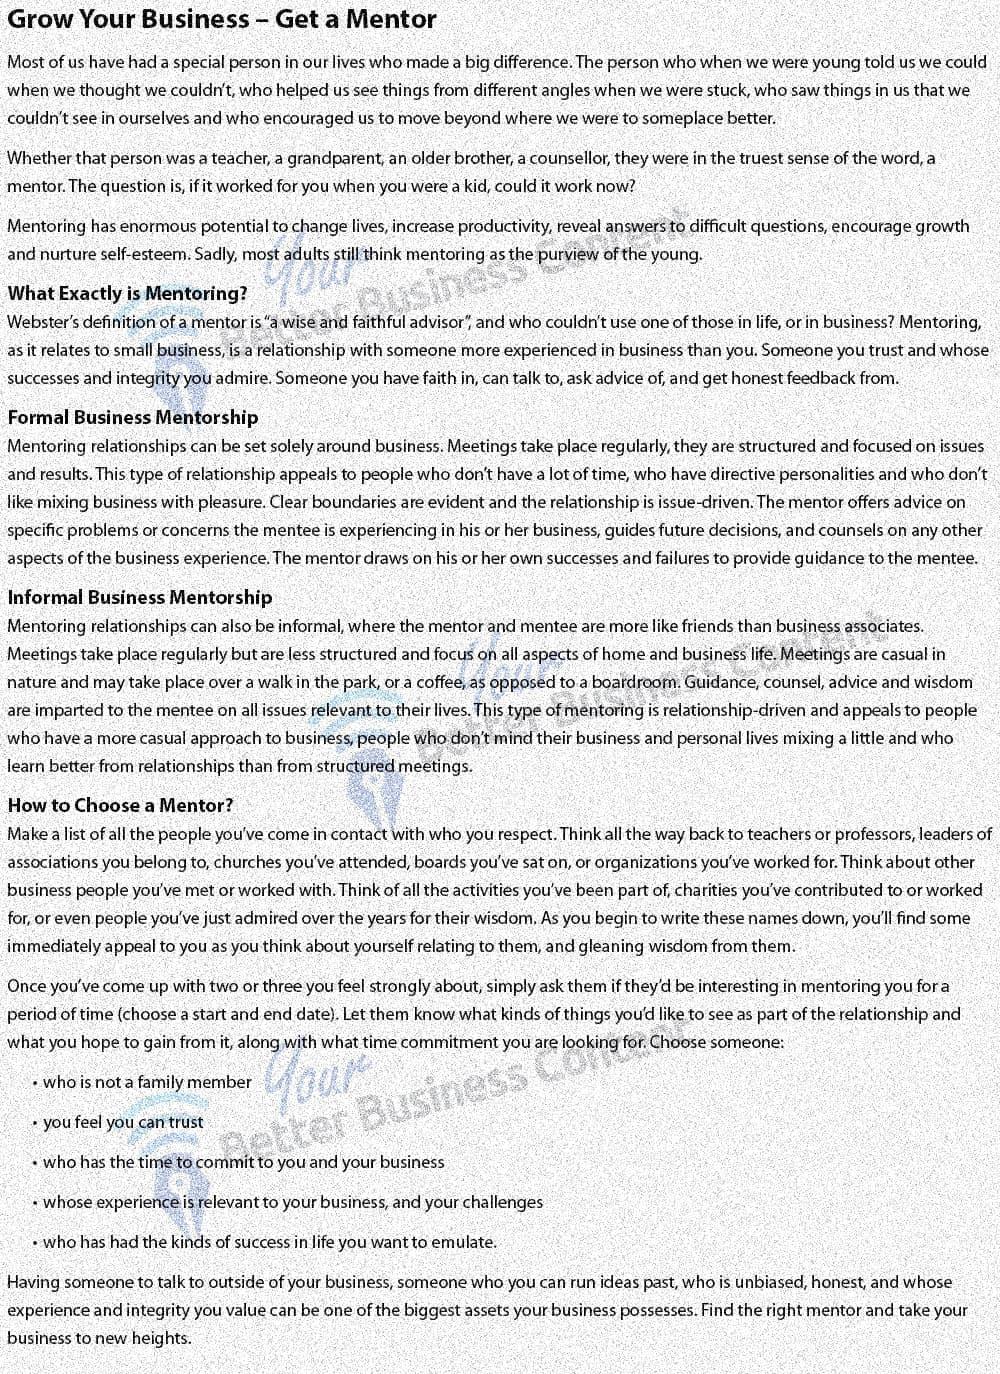 bn-09-16-008-mentoring_for_business_success